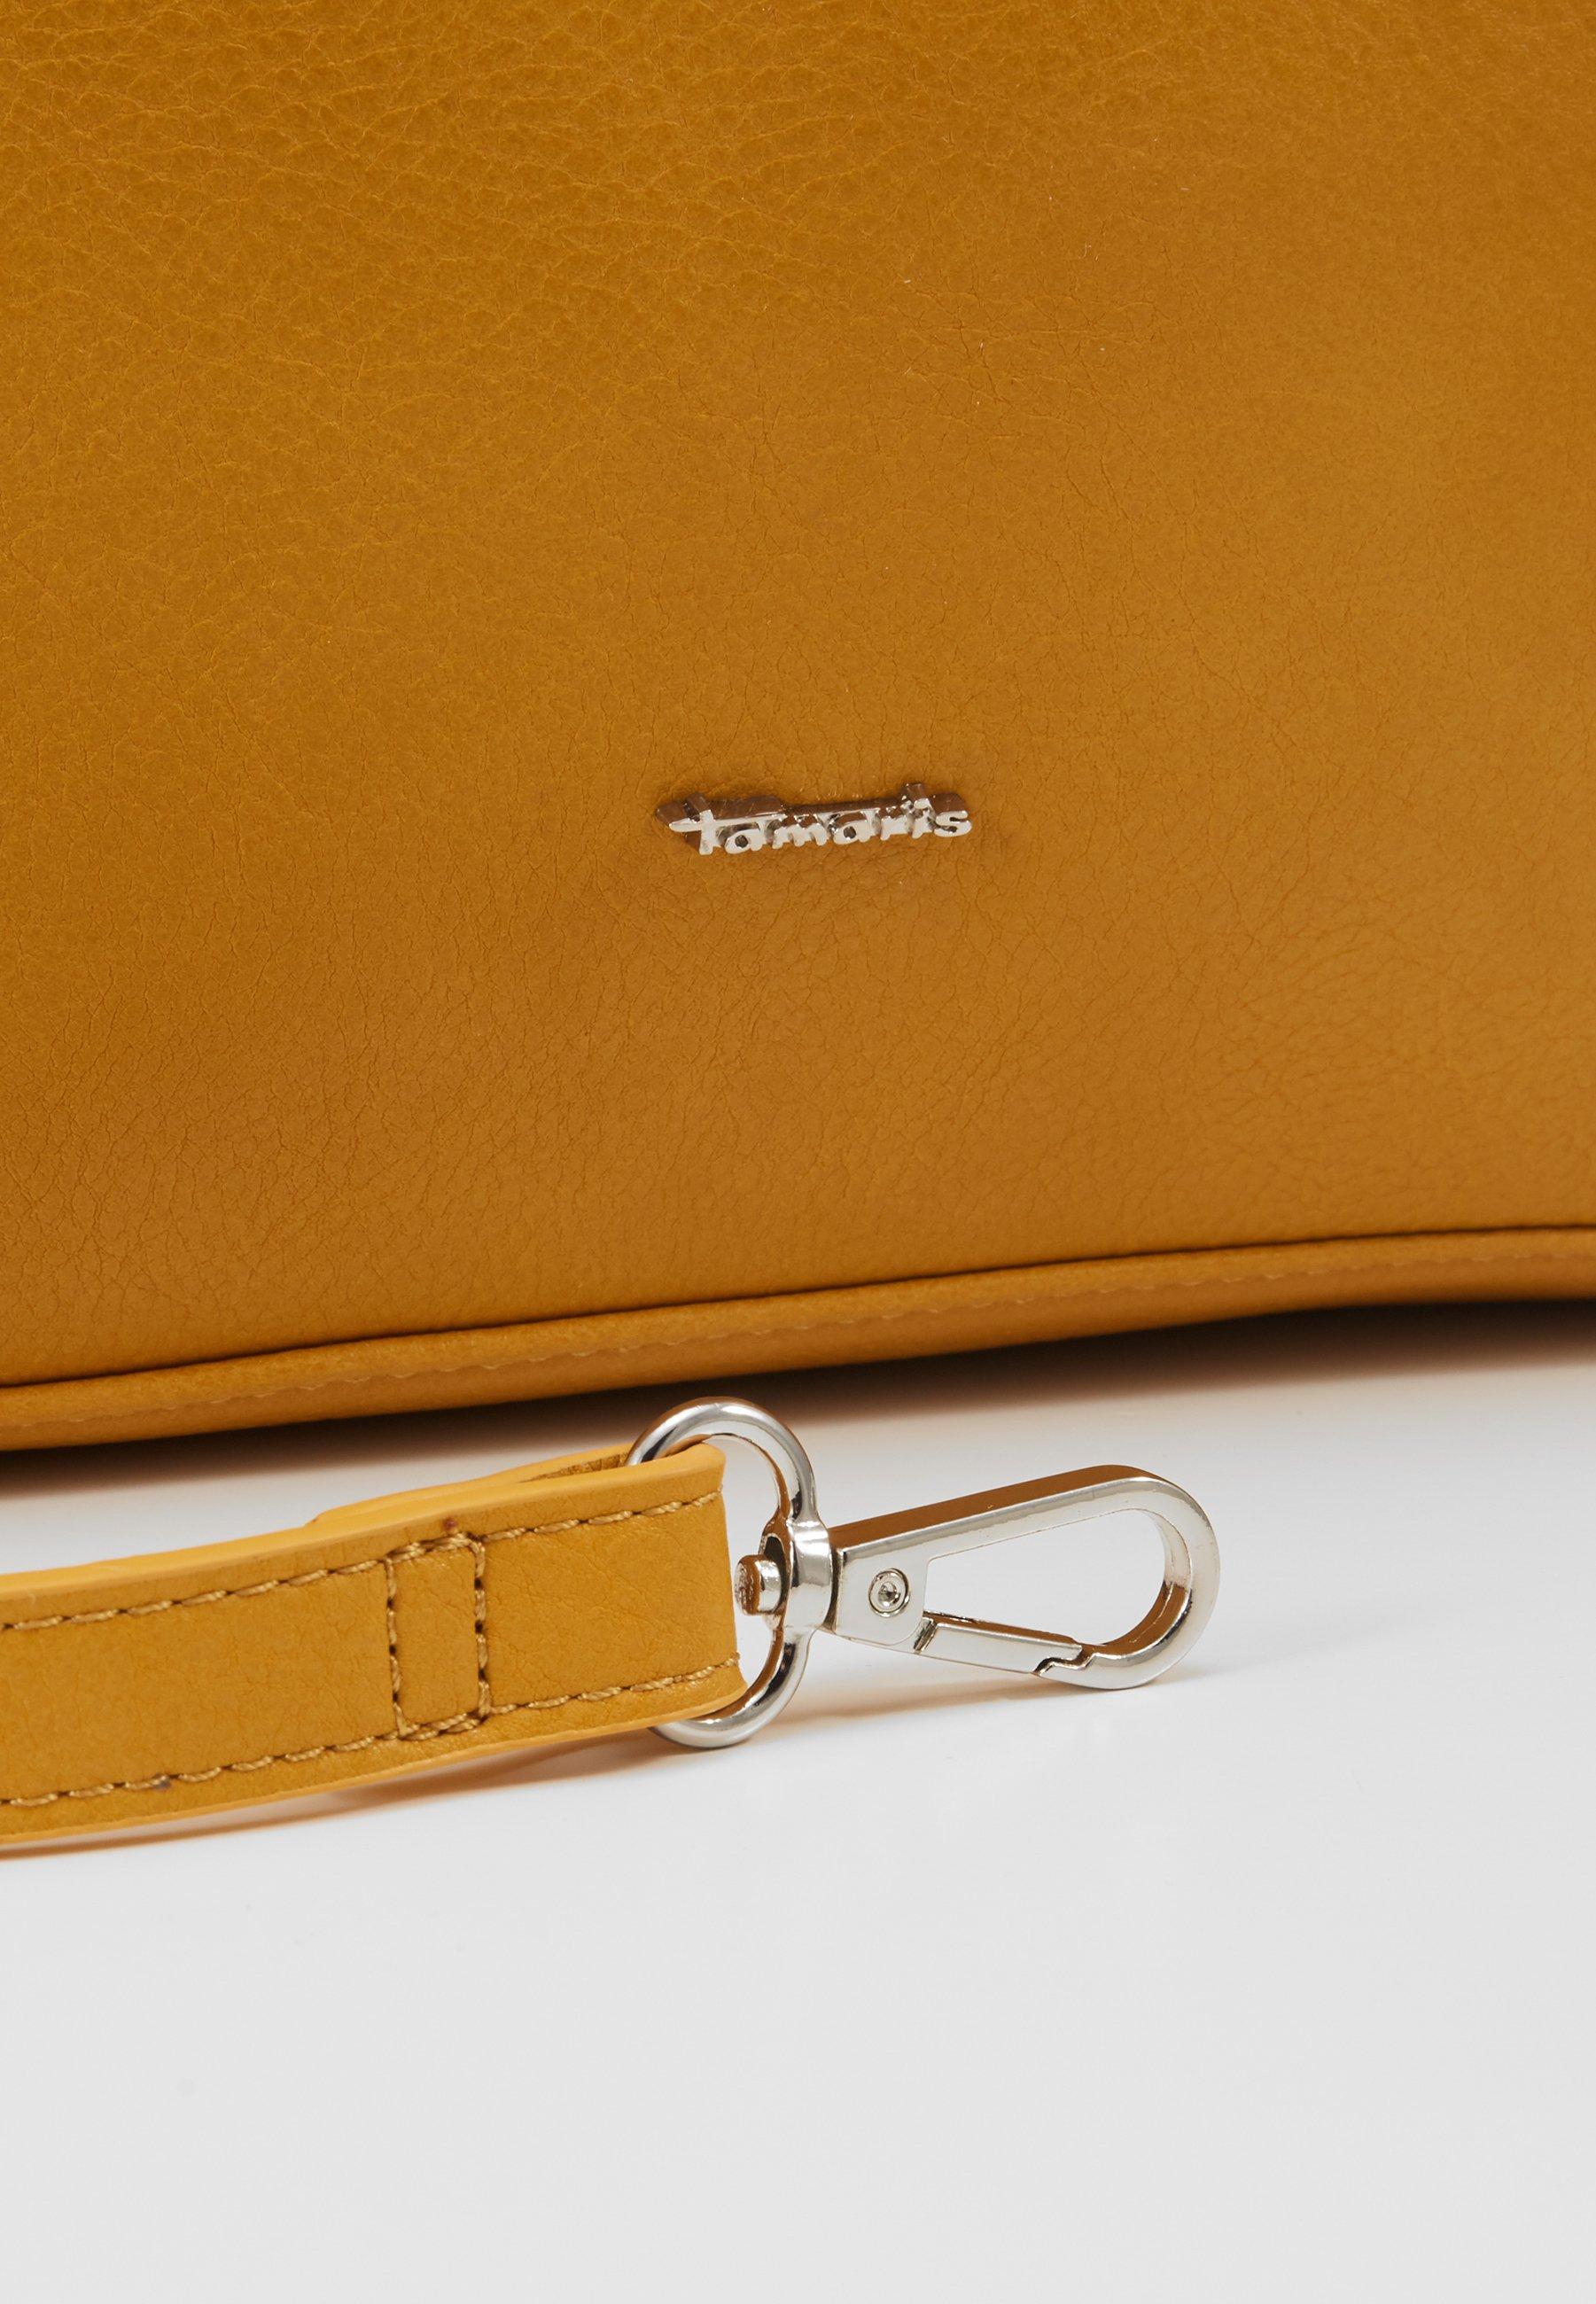 Tamaris Angela - Handbag Yellow